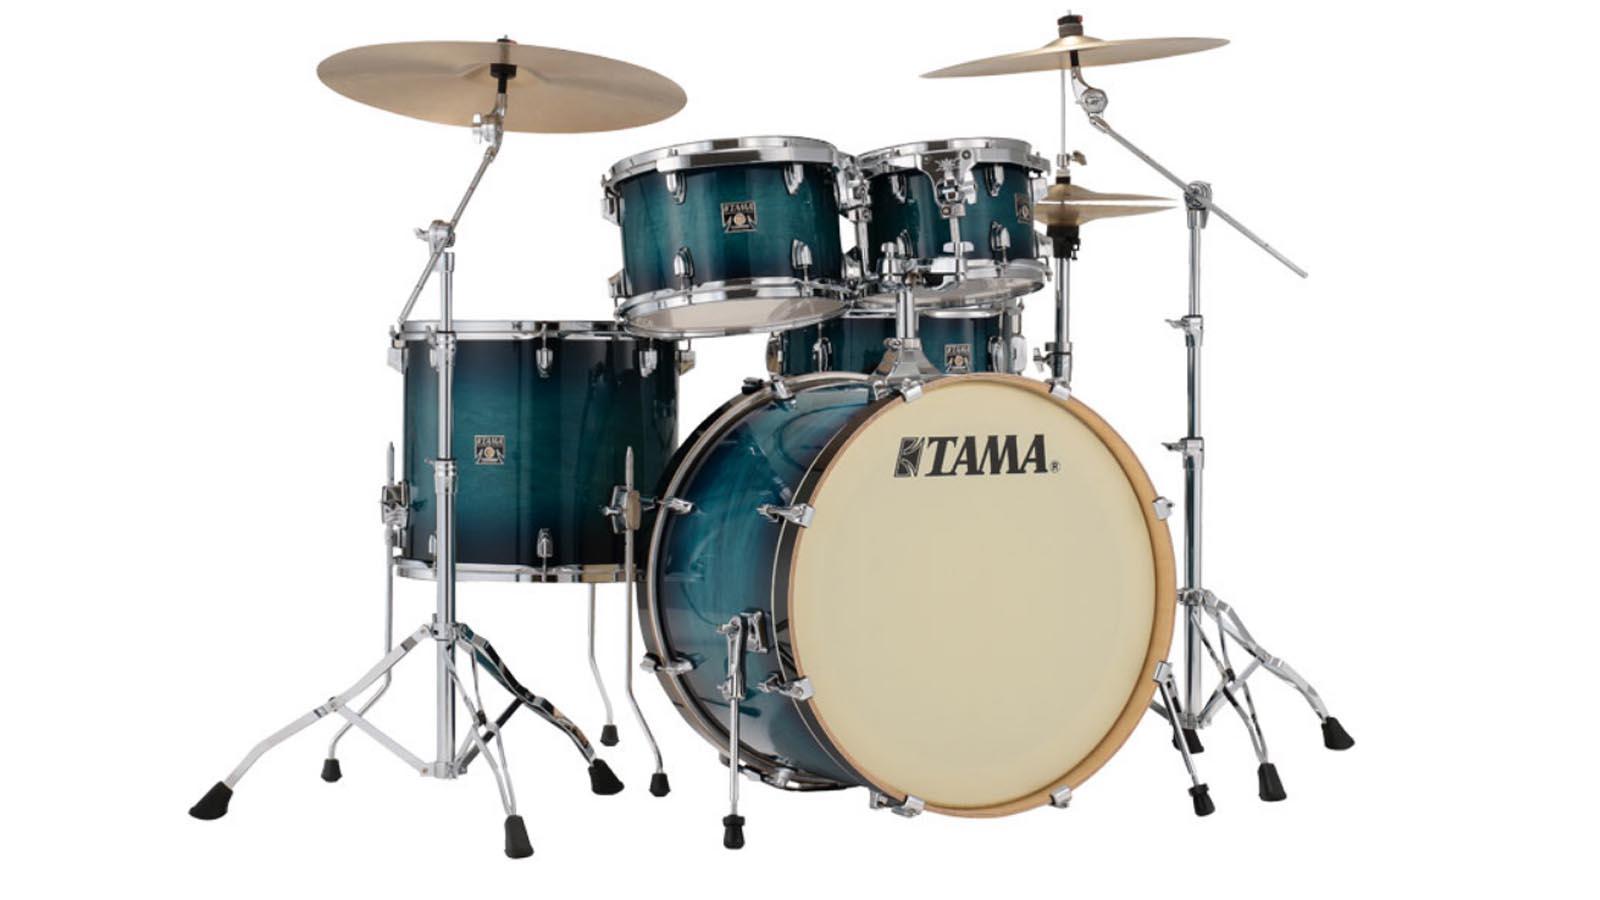 Tama CL50R-BAB  BLUE LACQUER BURST